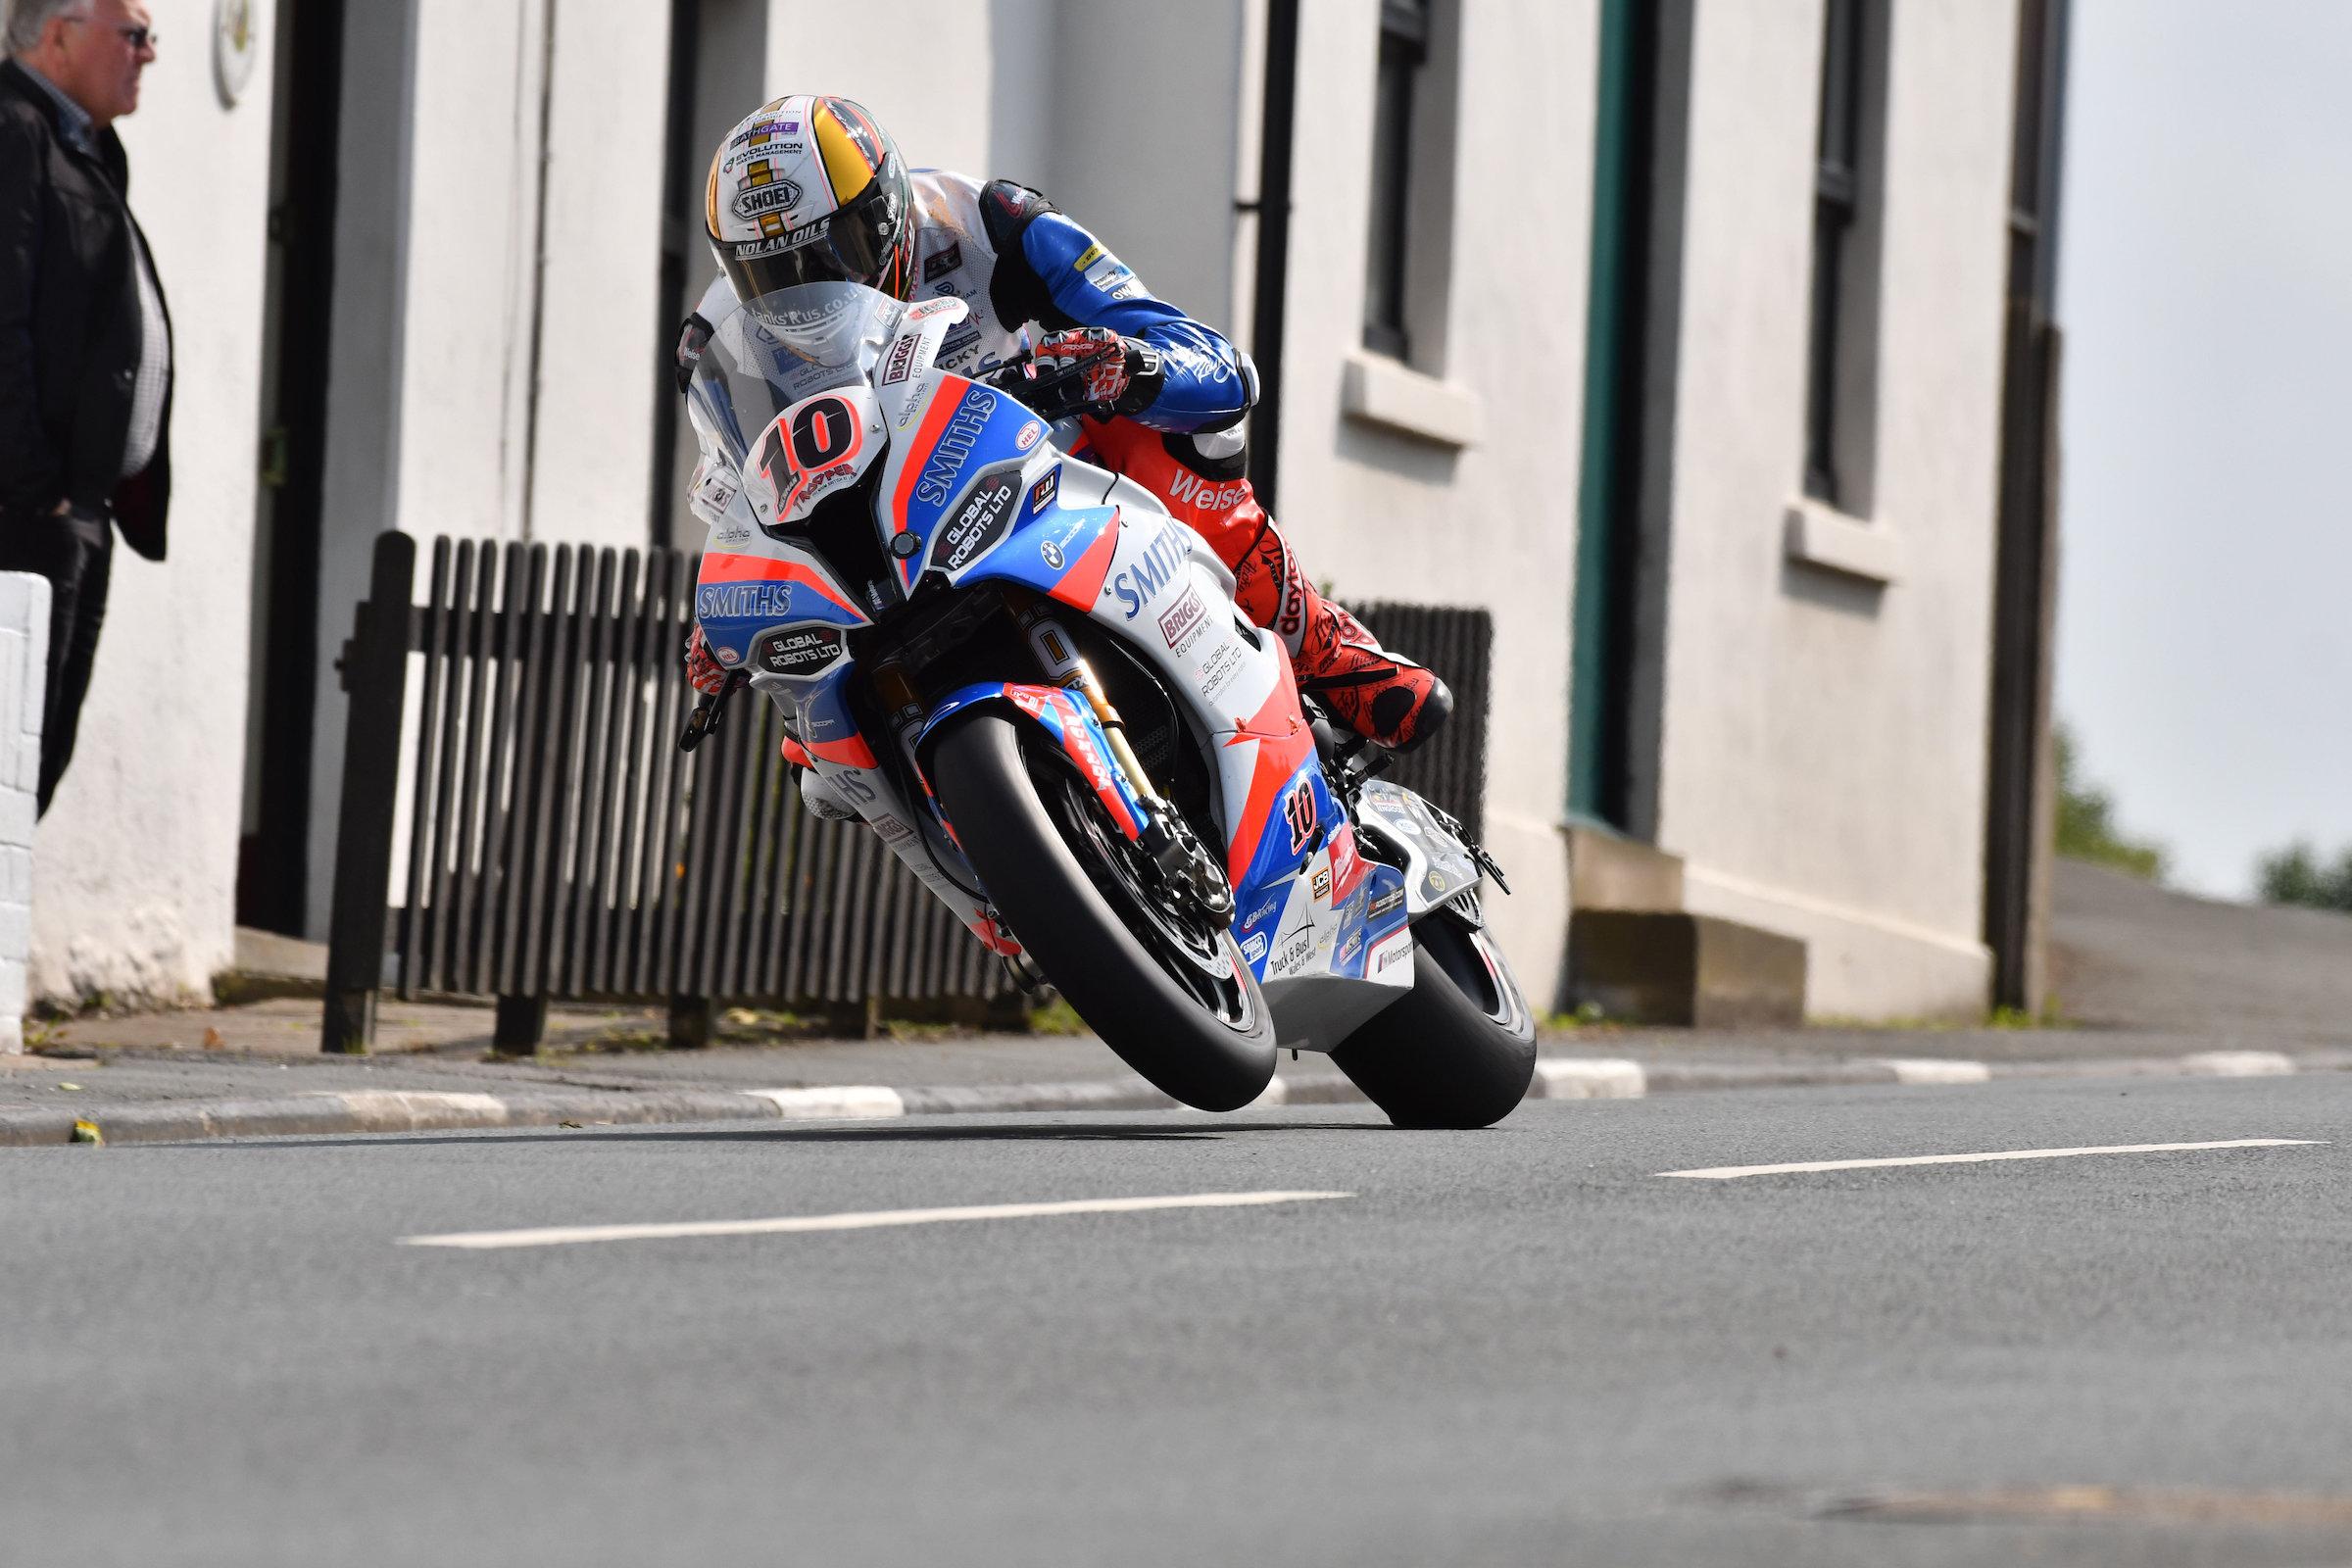 Peter Hickman Isle of Man TT 2019 winner